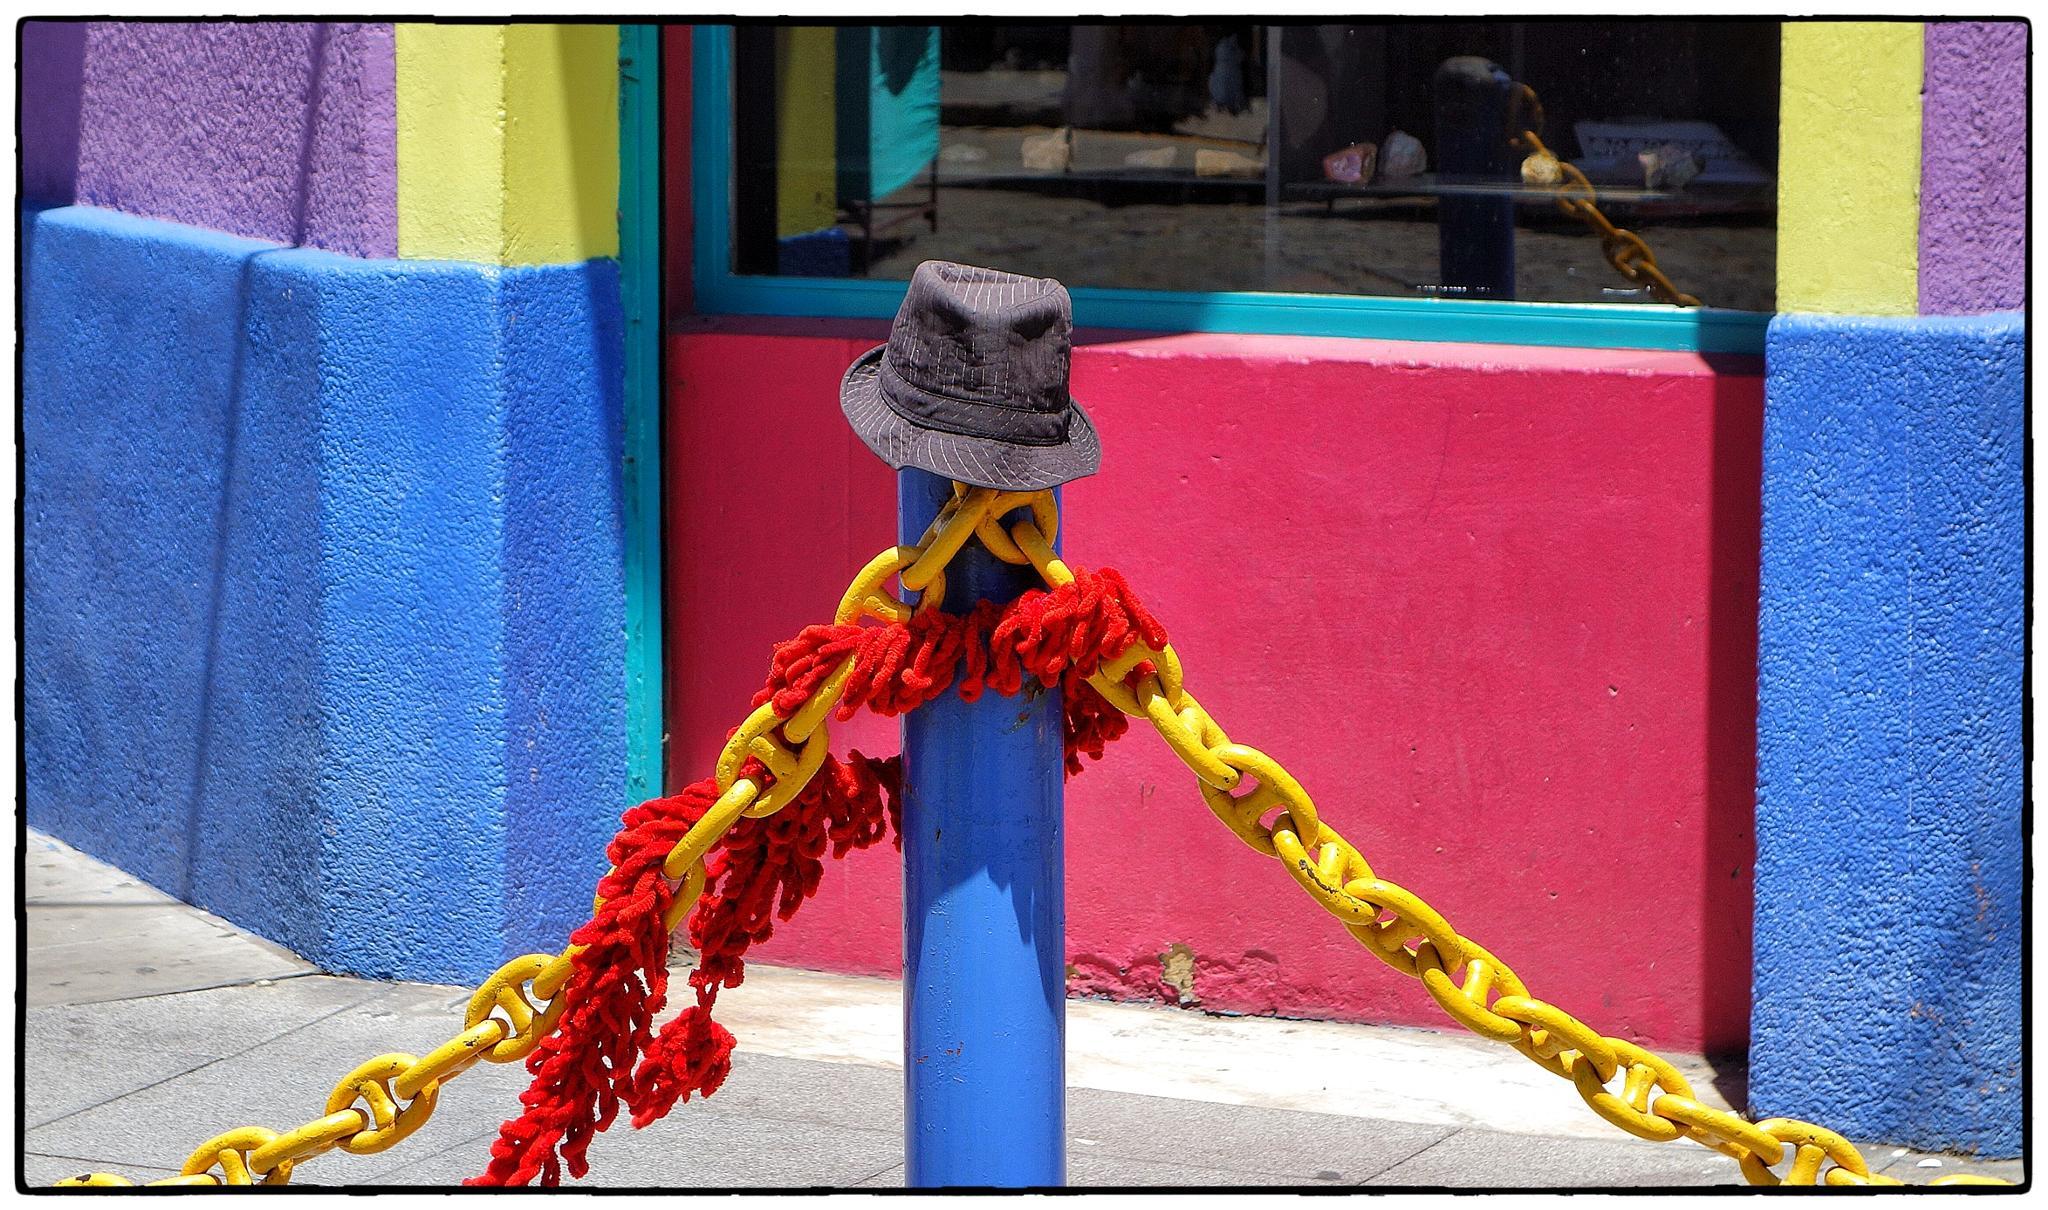 Caminito, un barret i molts colors by bescosx